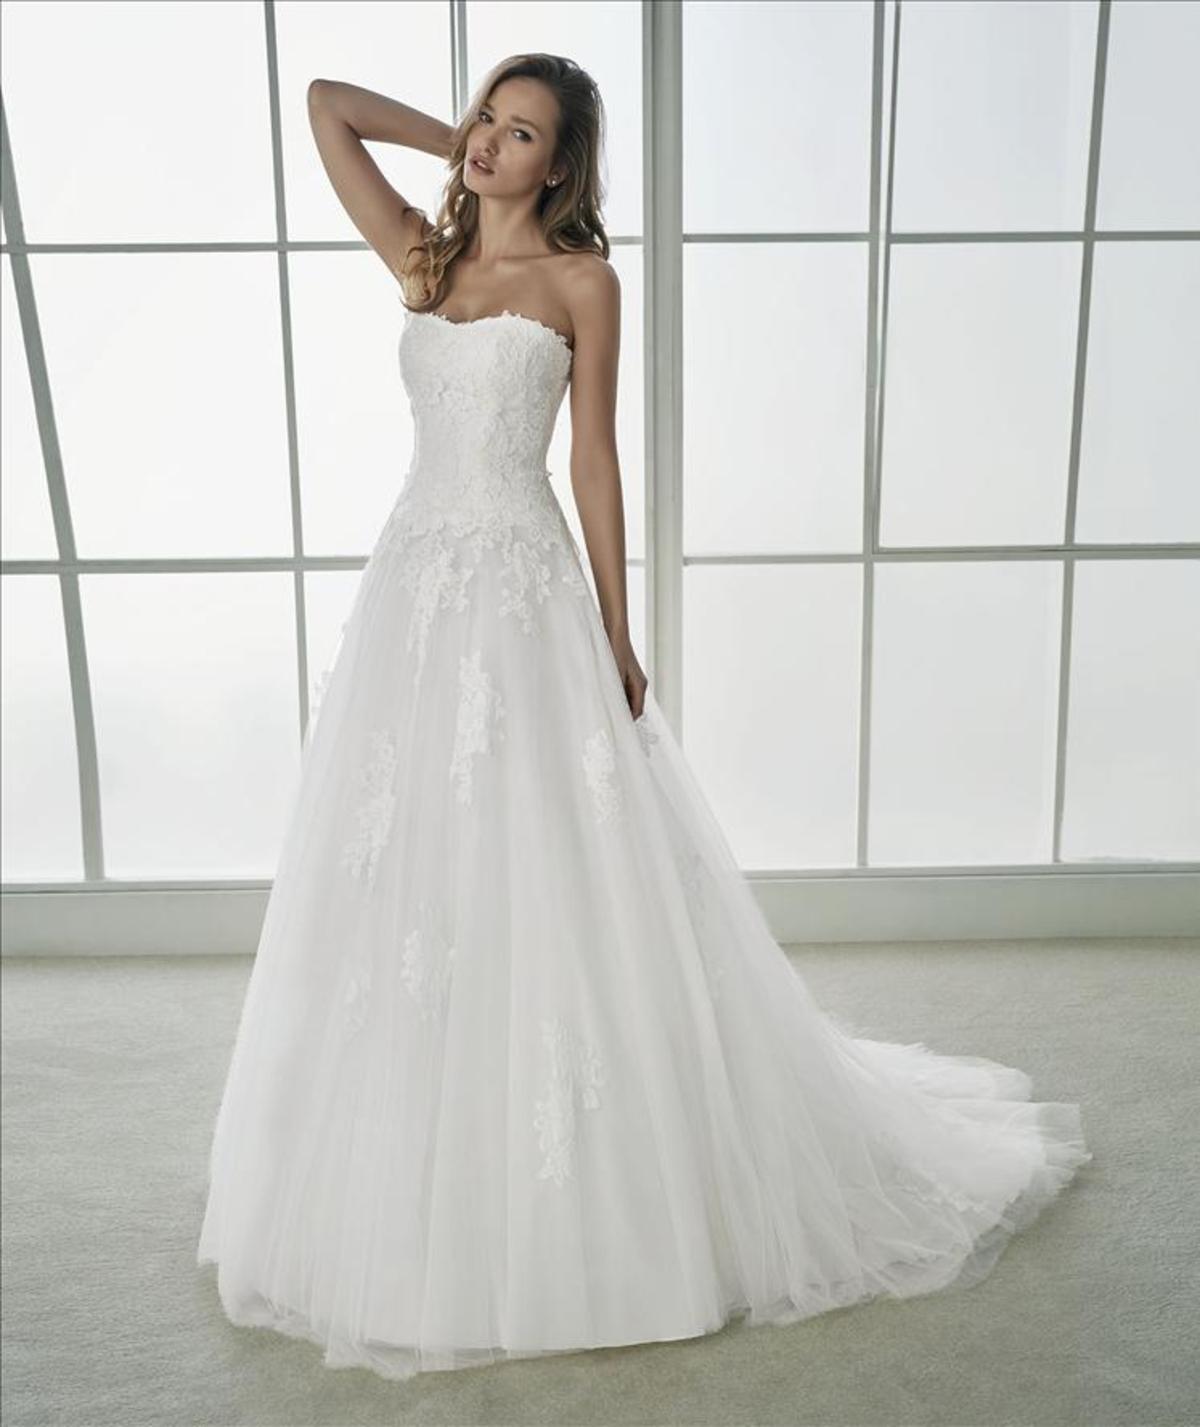 W1 Brautkleid FELIPA B PV18 748 888 - Wir sagen Ja!